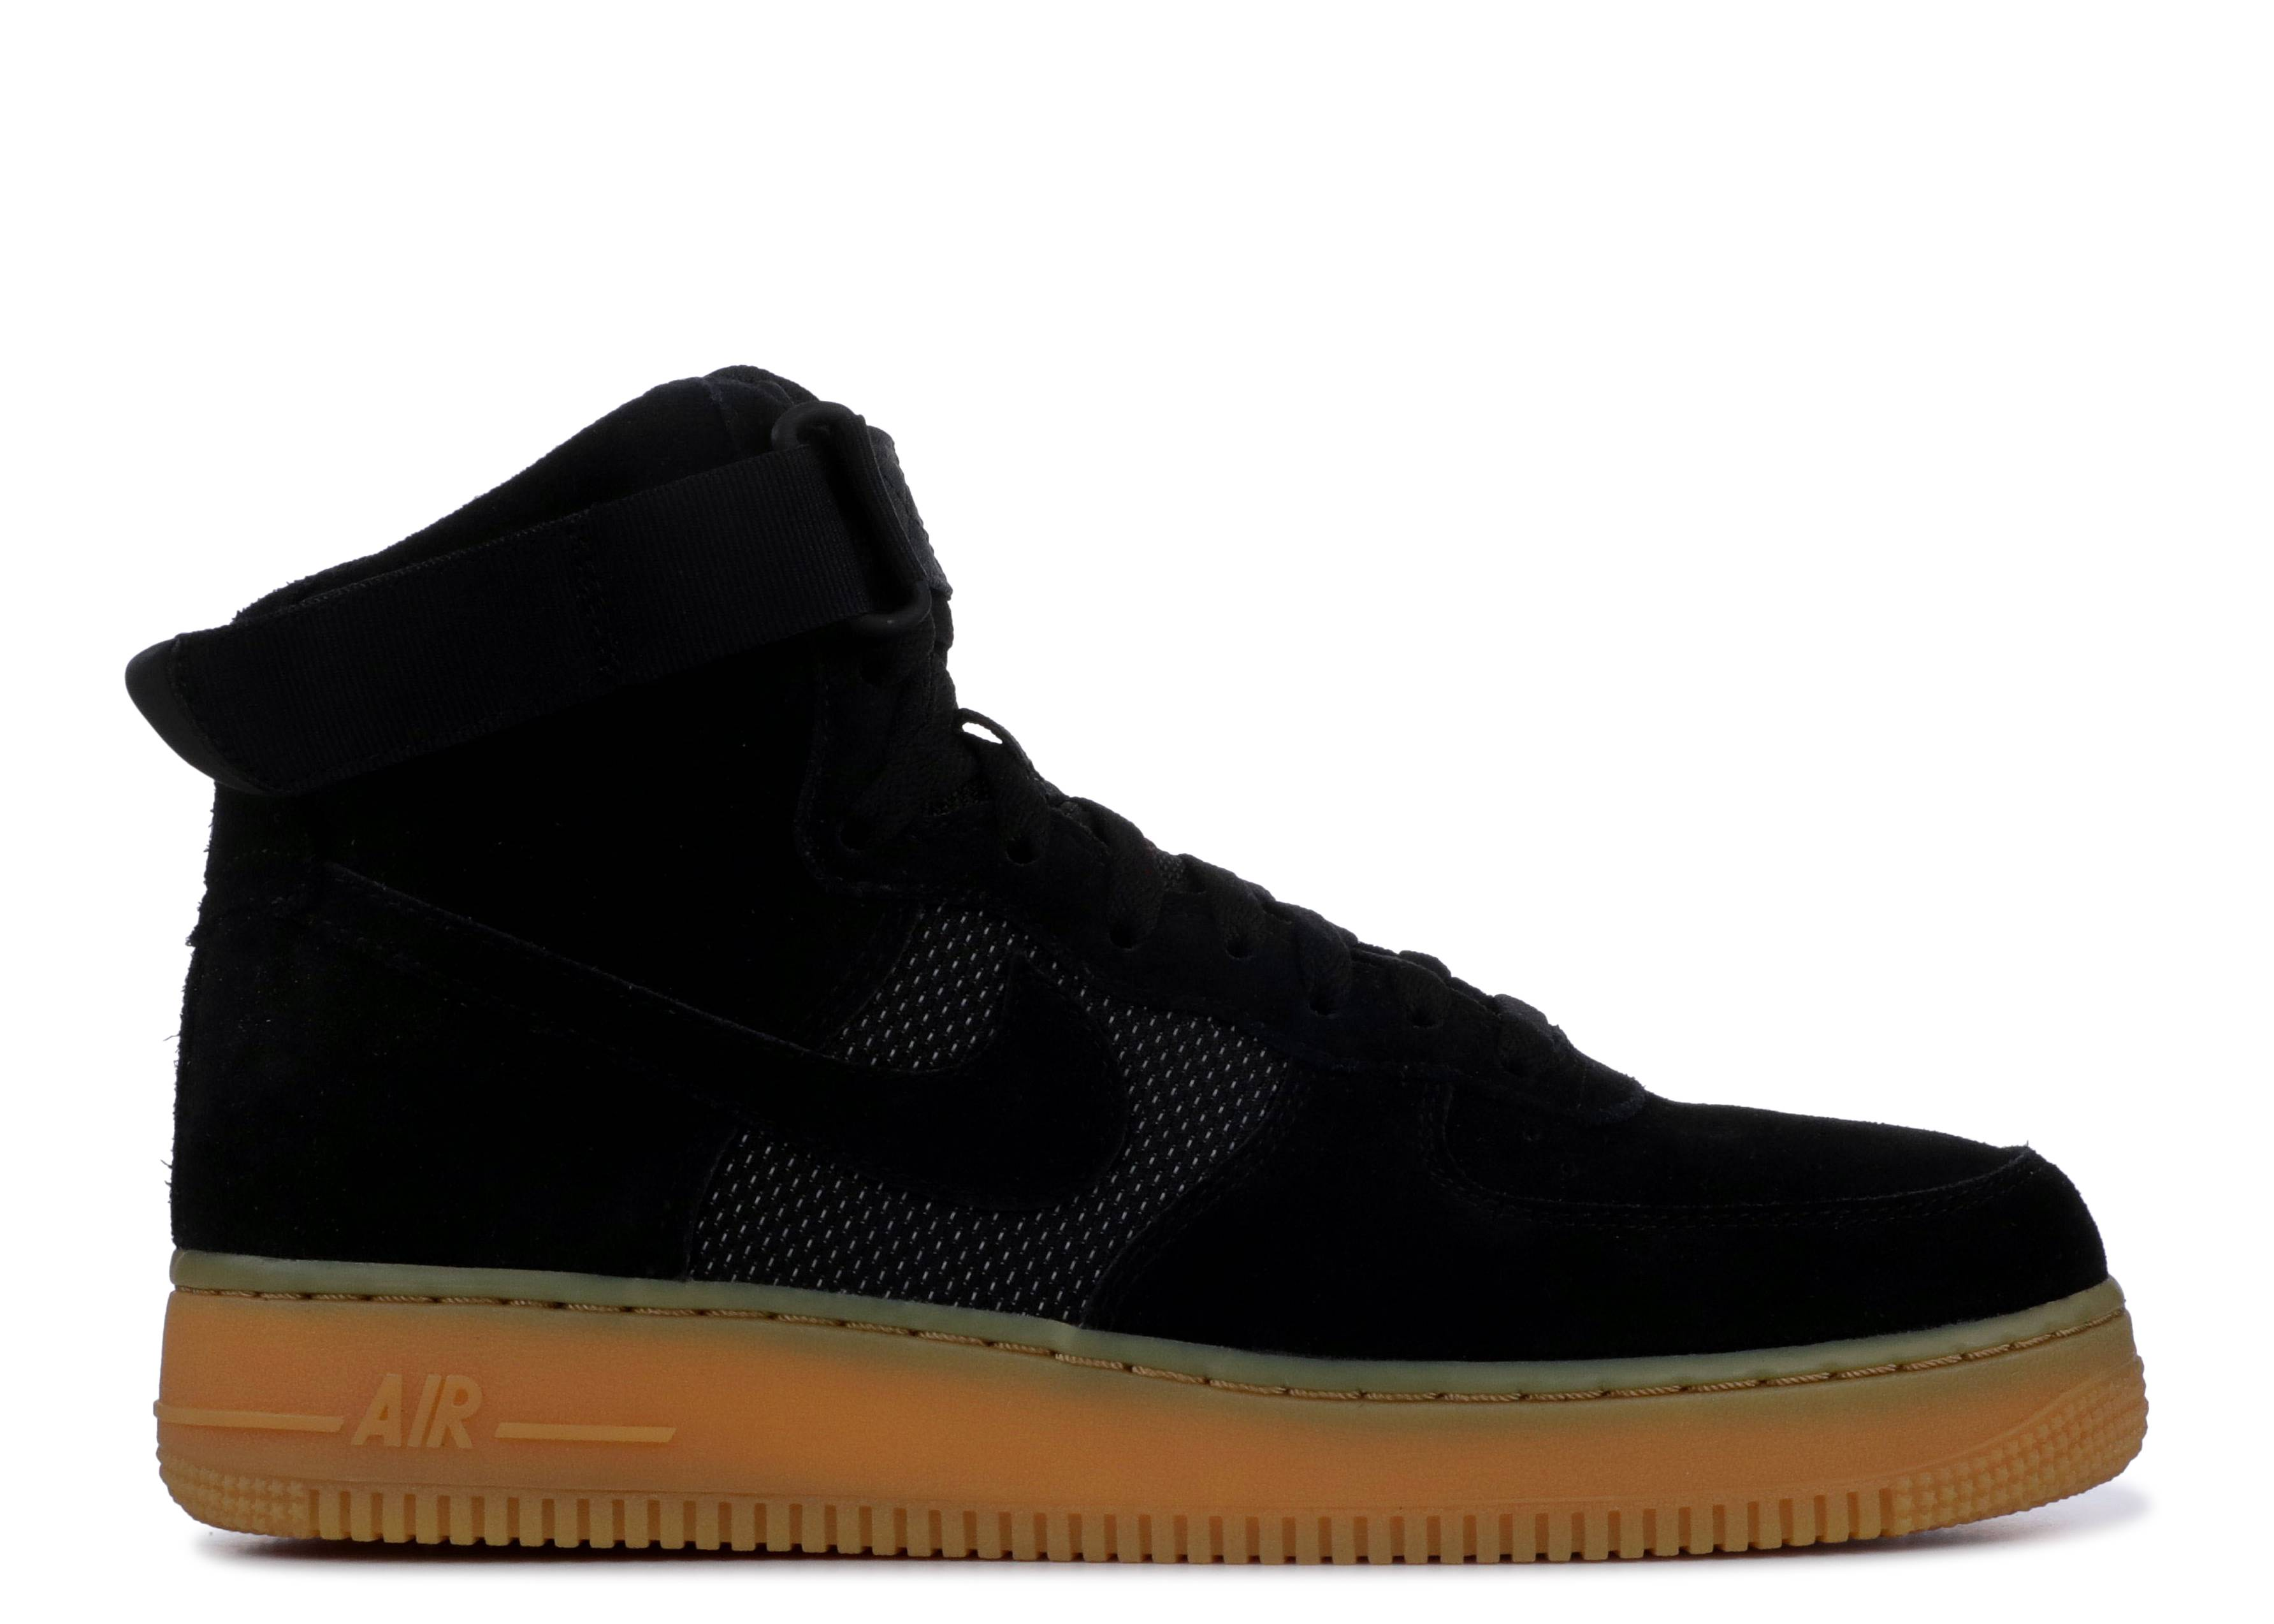 Air Force 1 High 07 Lv8 - Nike - 806403 003 - black black gum light ... 5cd66752ec